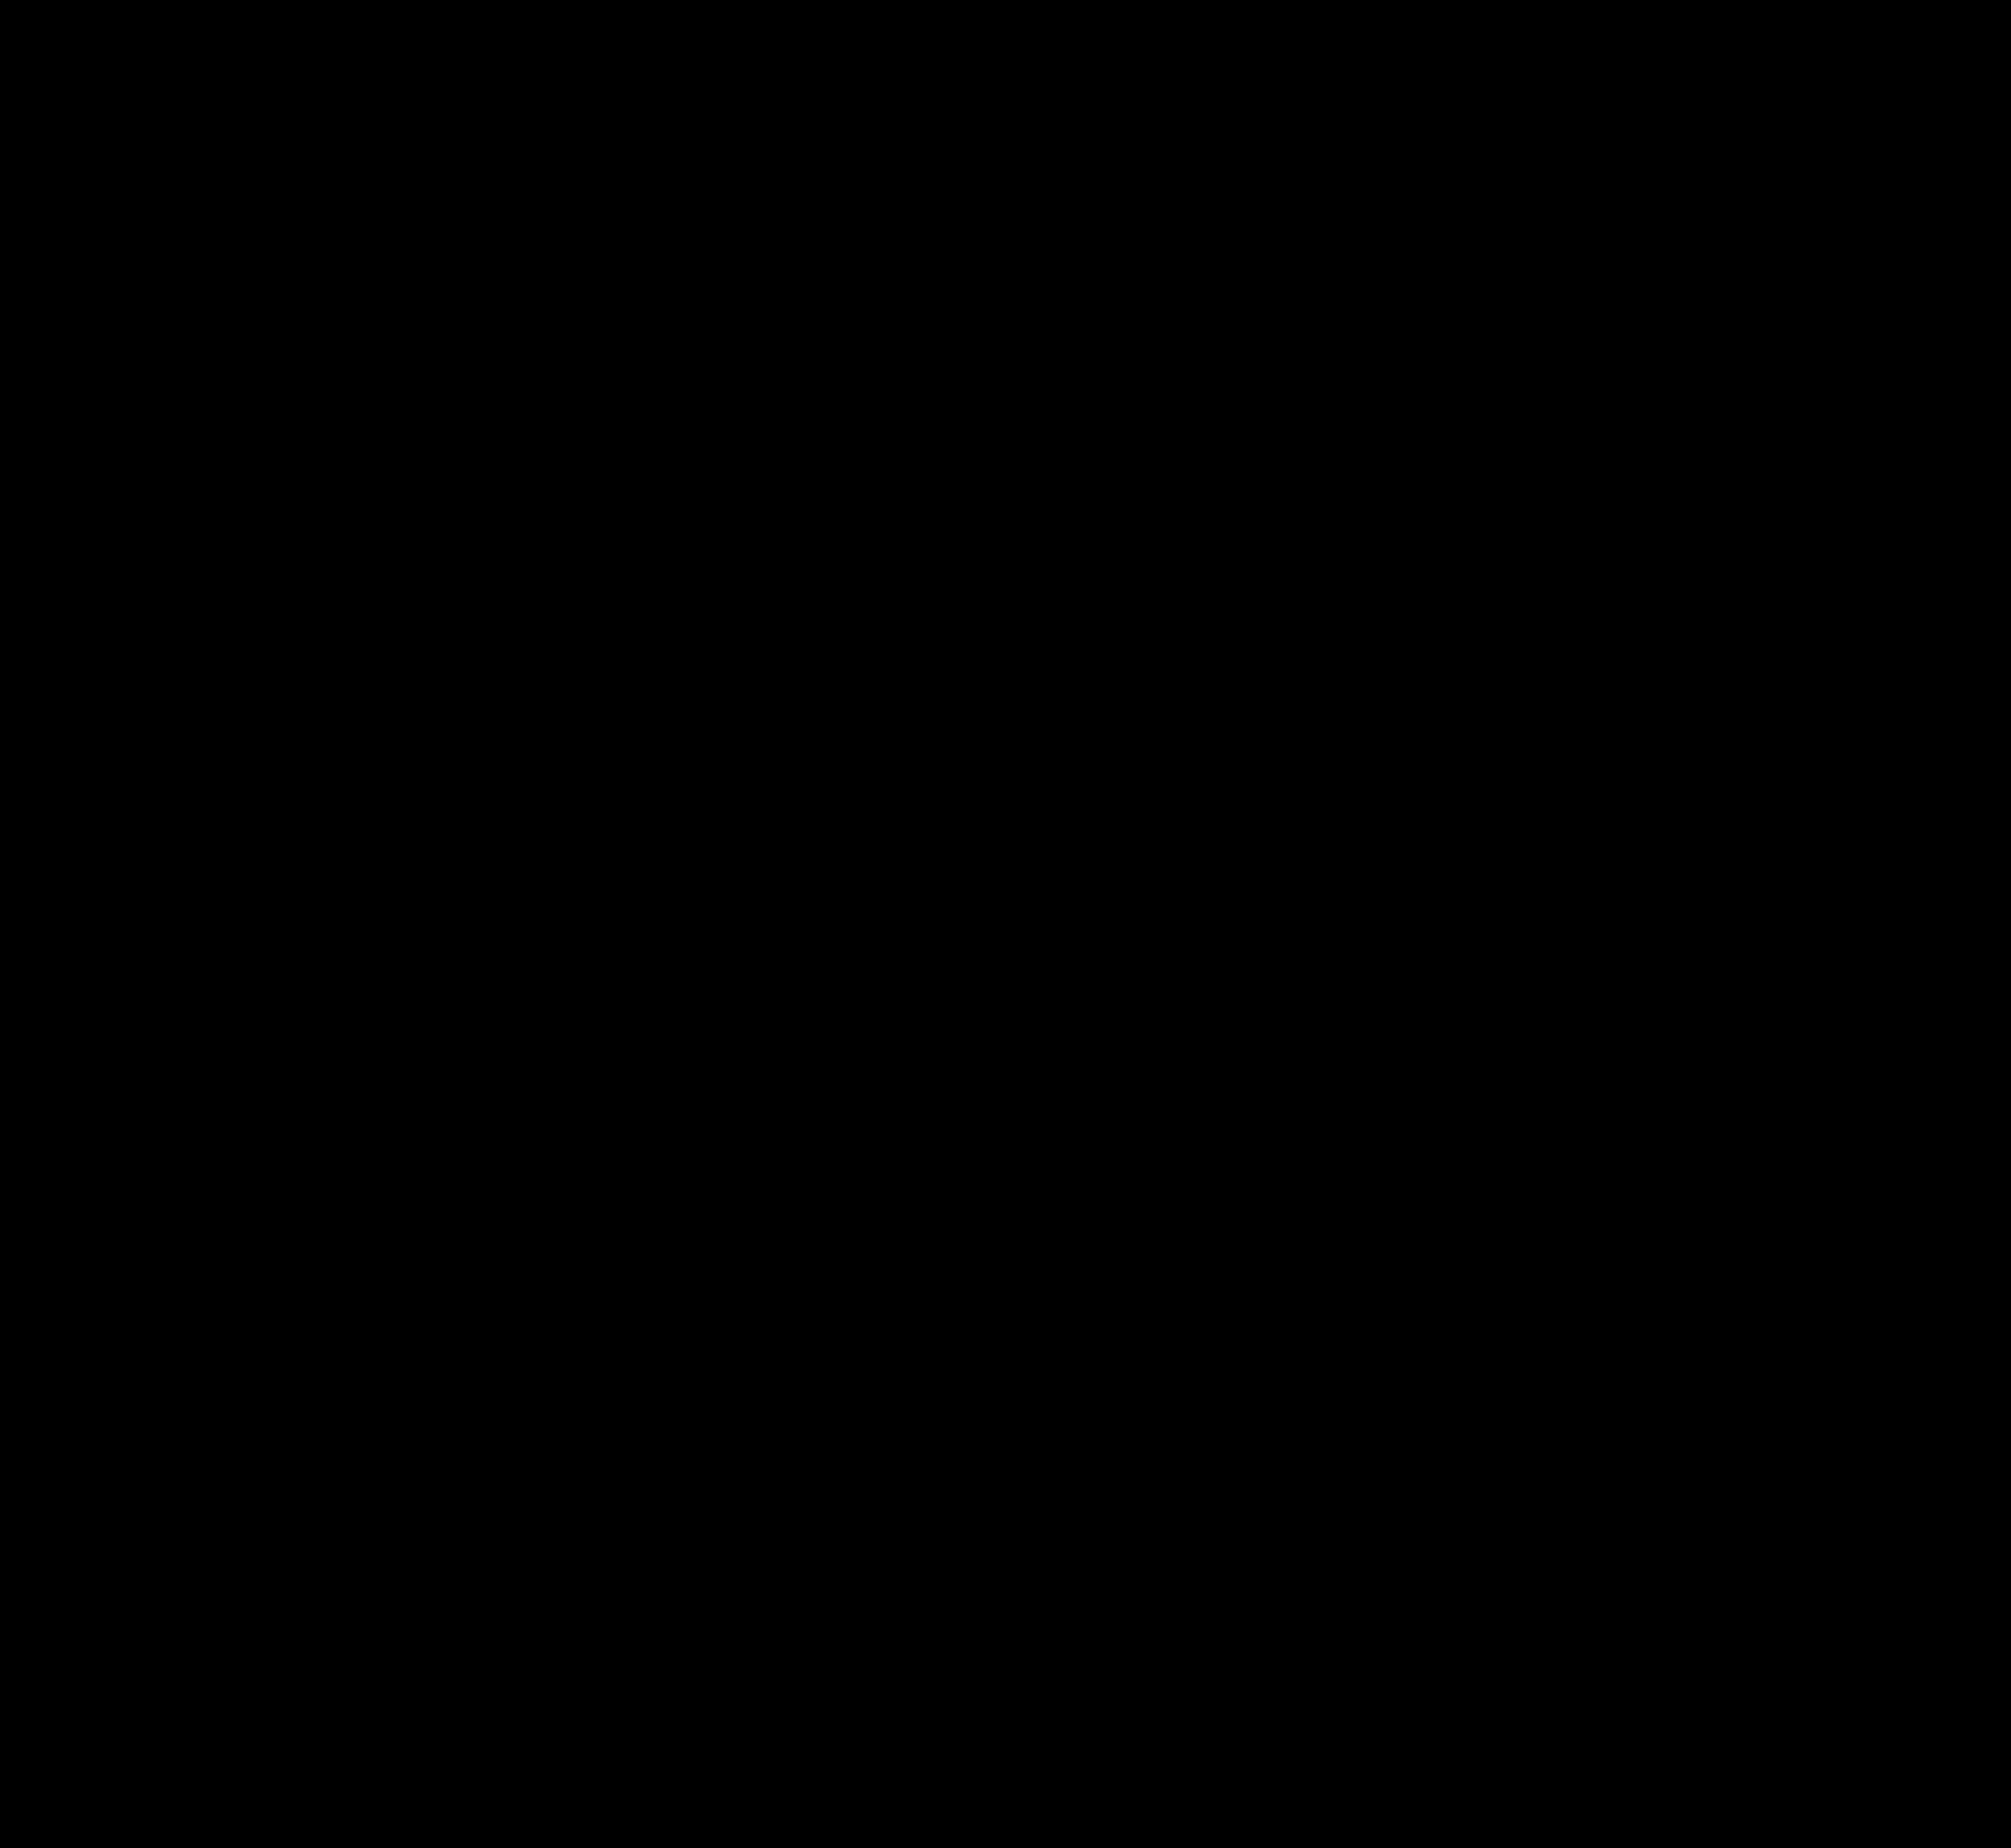 Hammer Silhouette